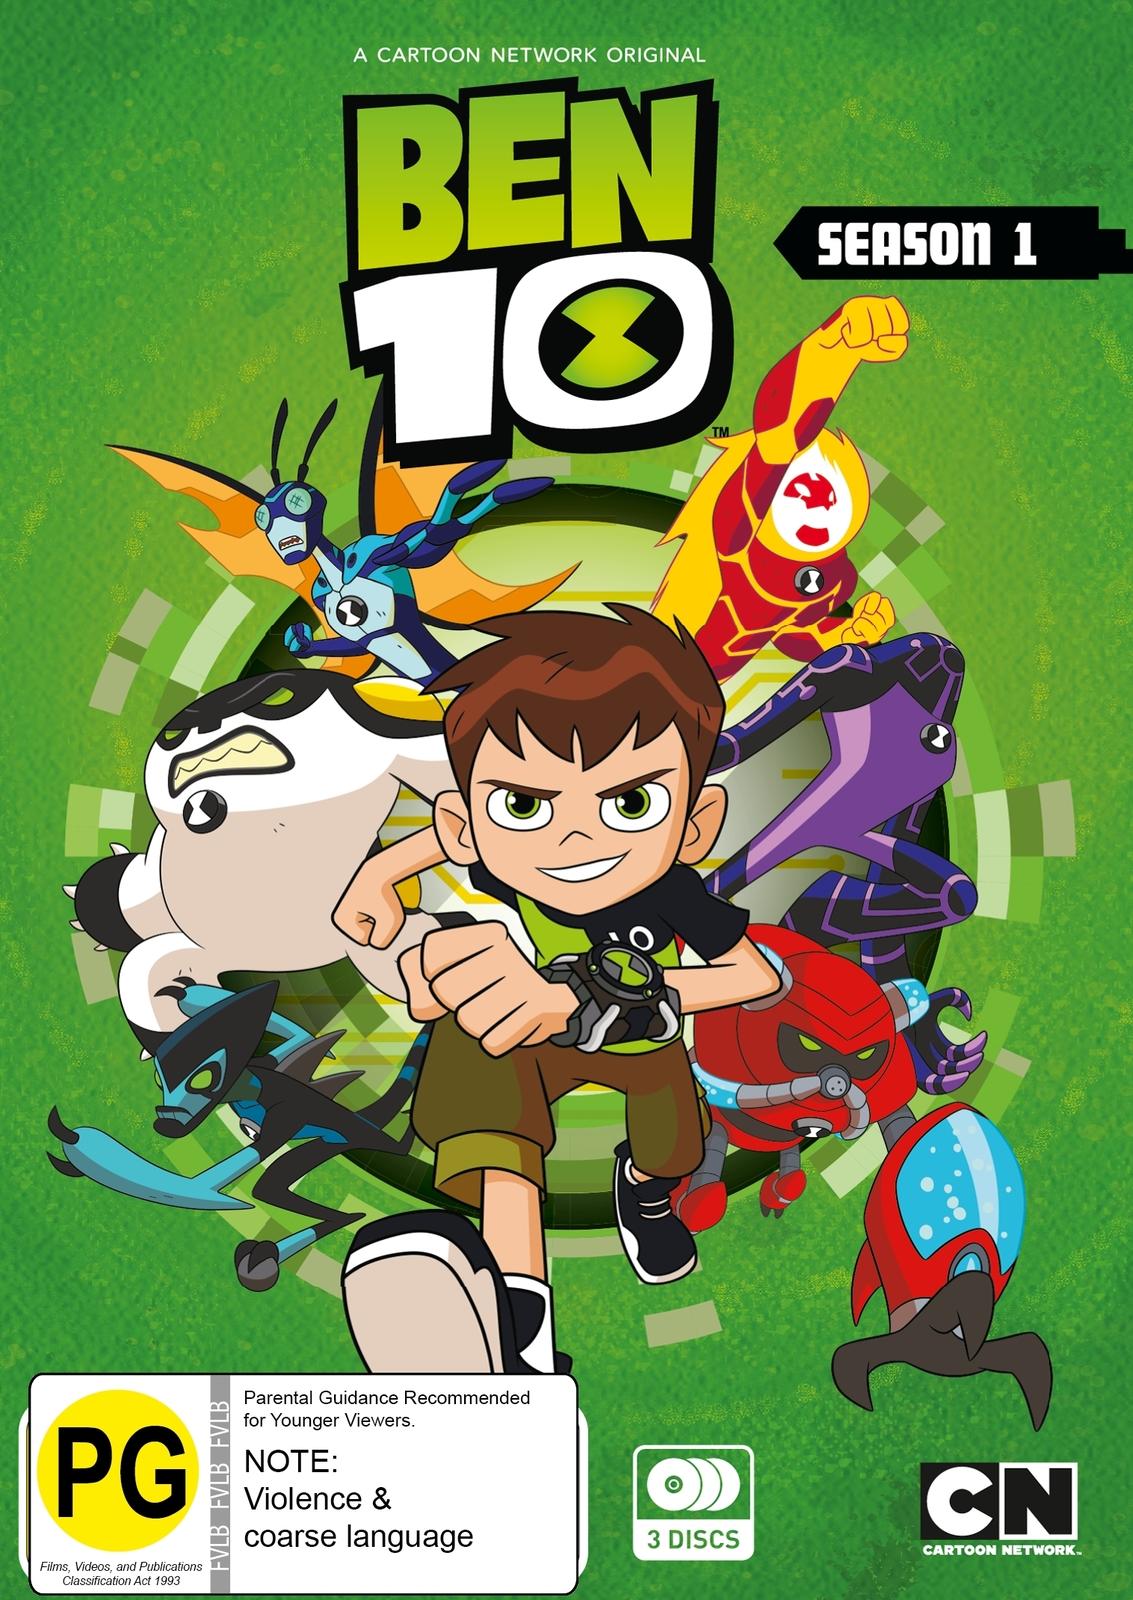 Ben 10 (2016) Season 1